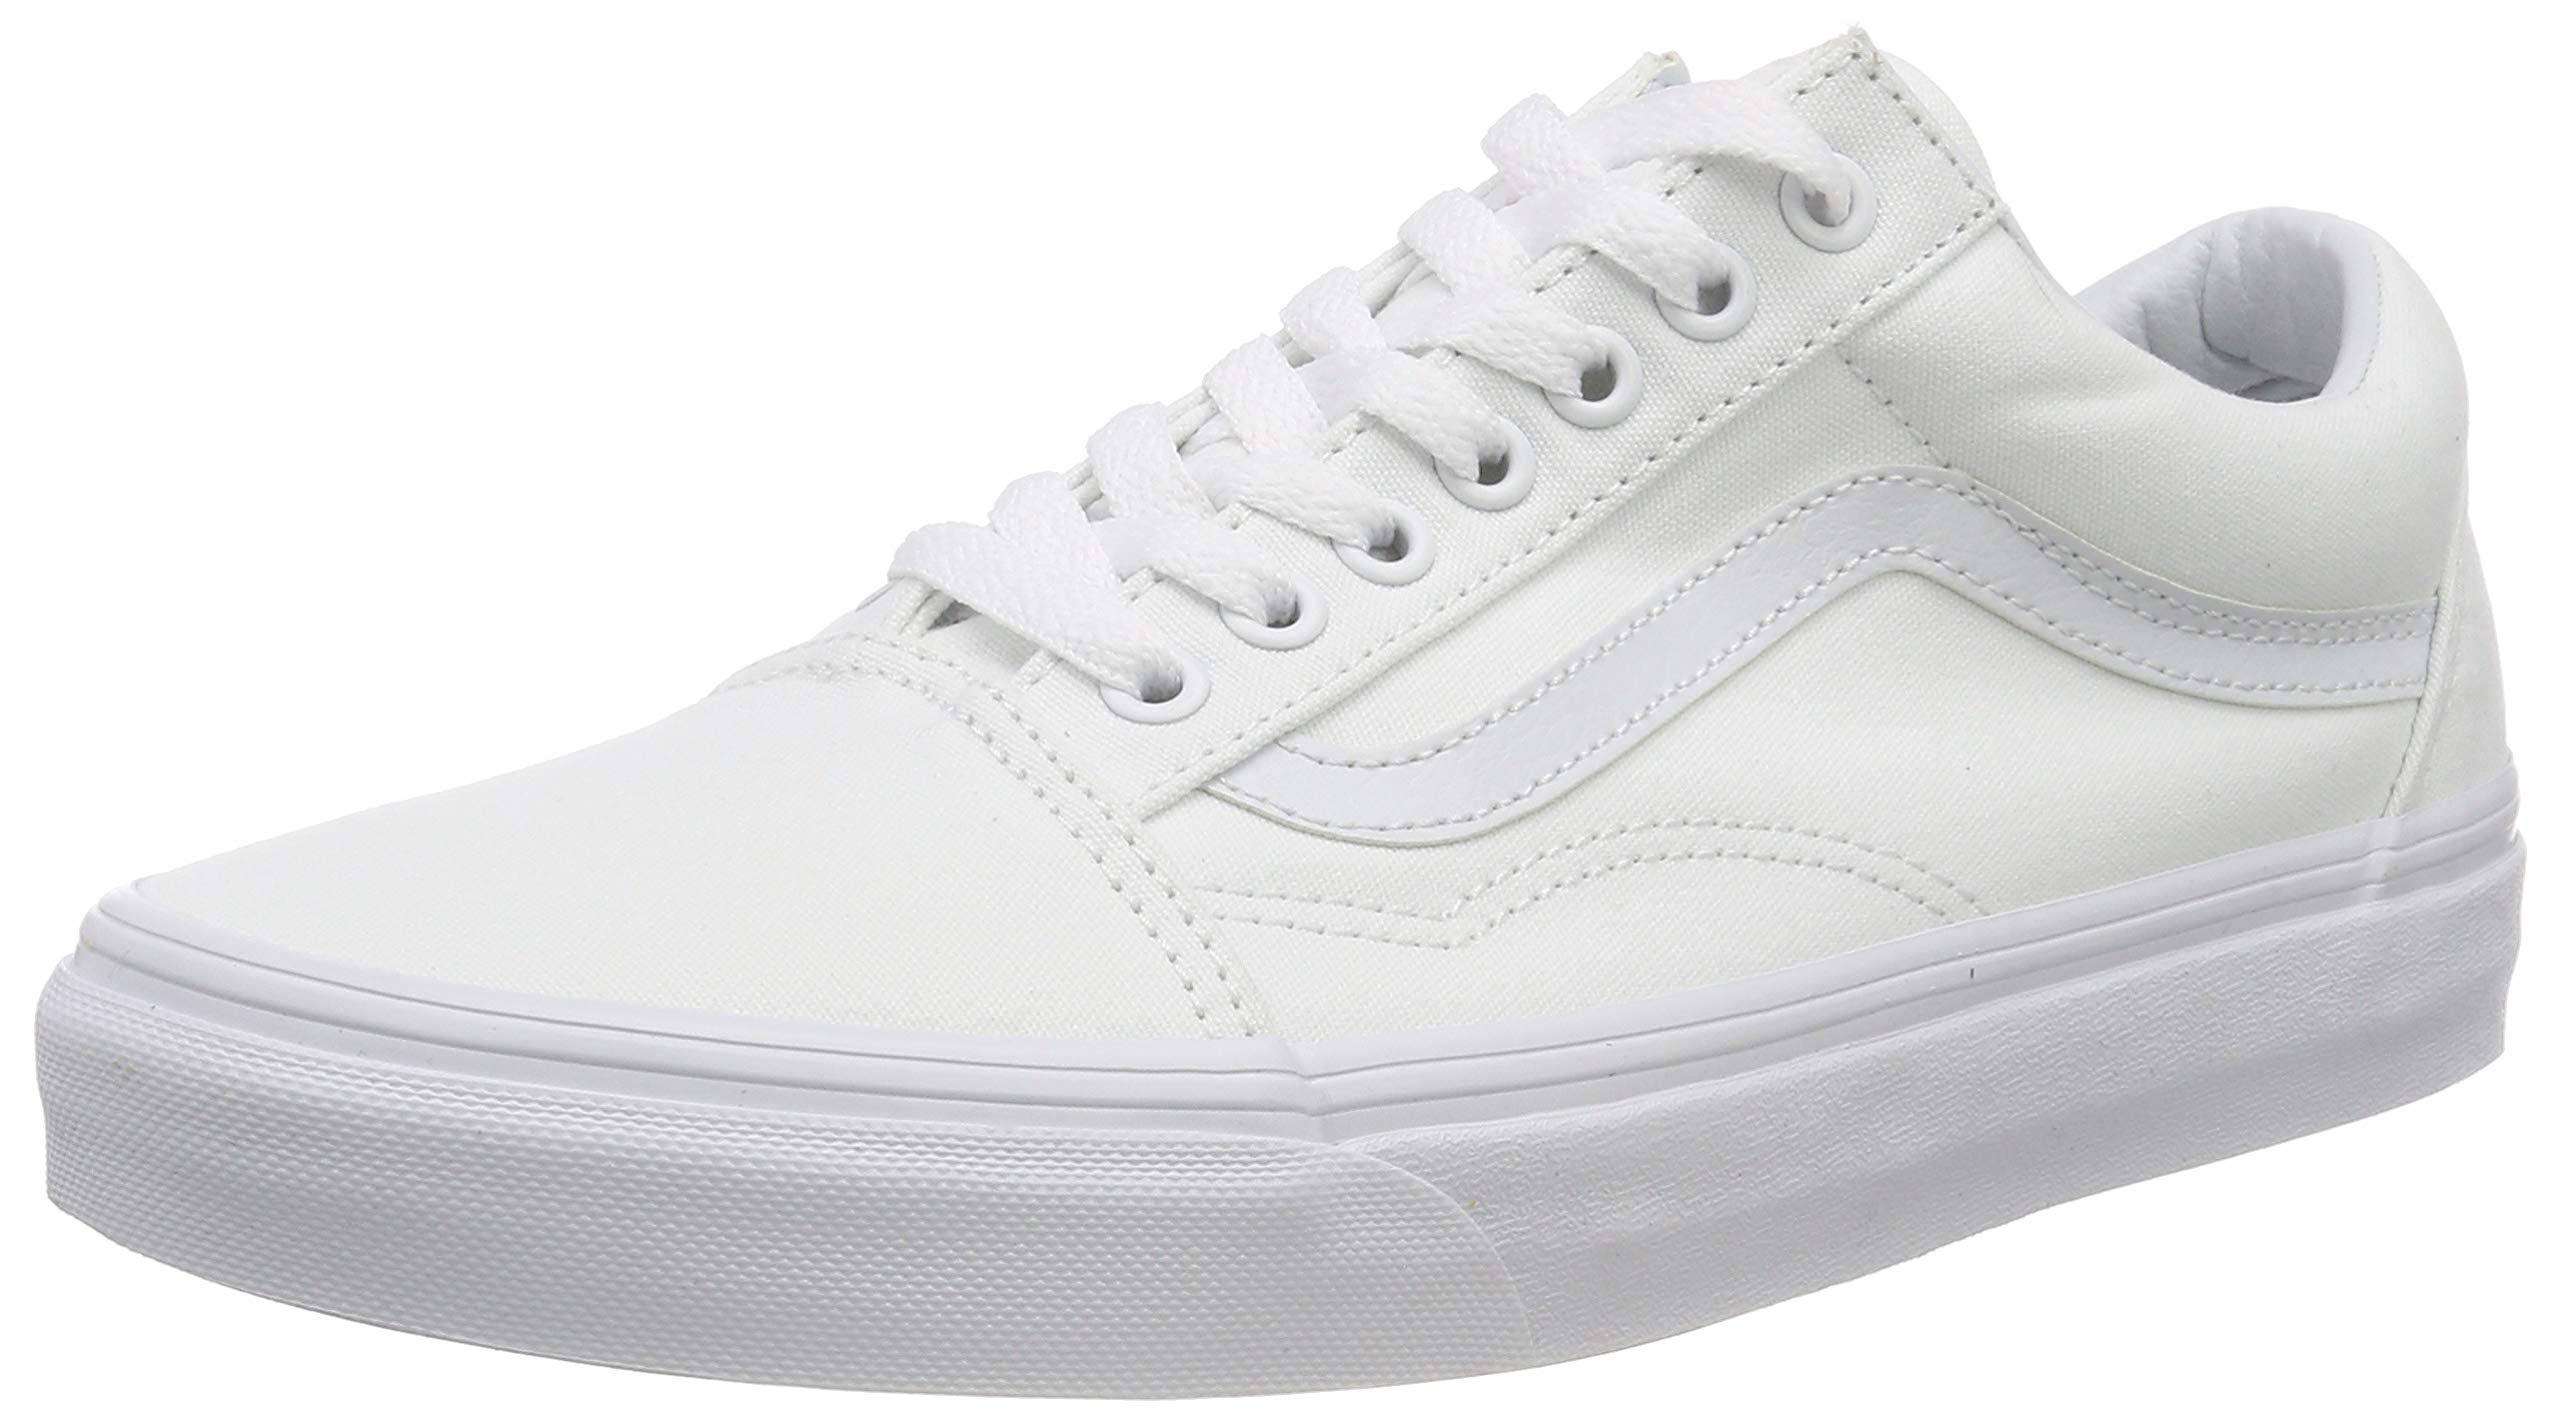 Old Shoes Size Vans Canvas Skool Men's White 9 5 wExHOIFq